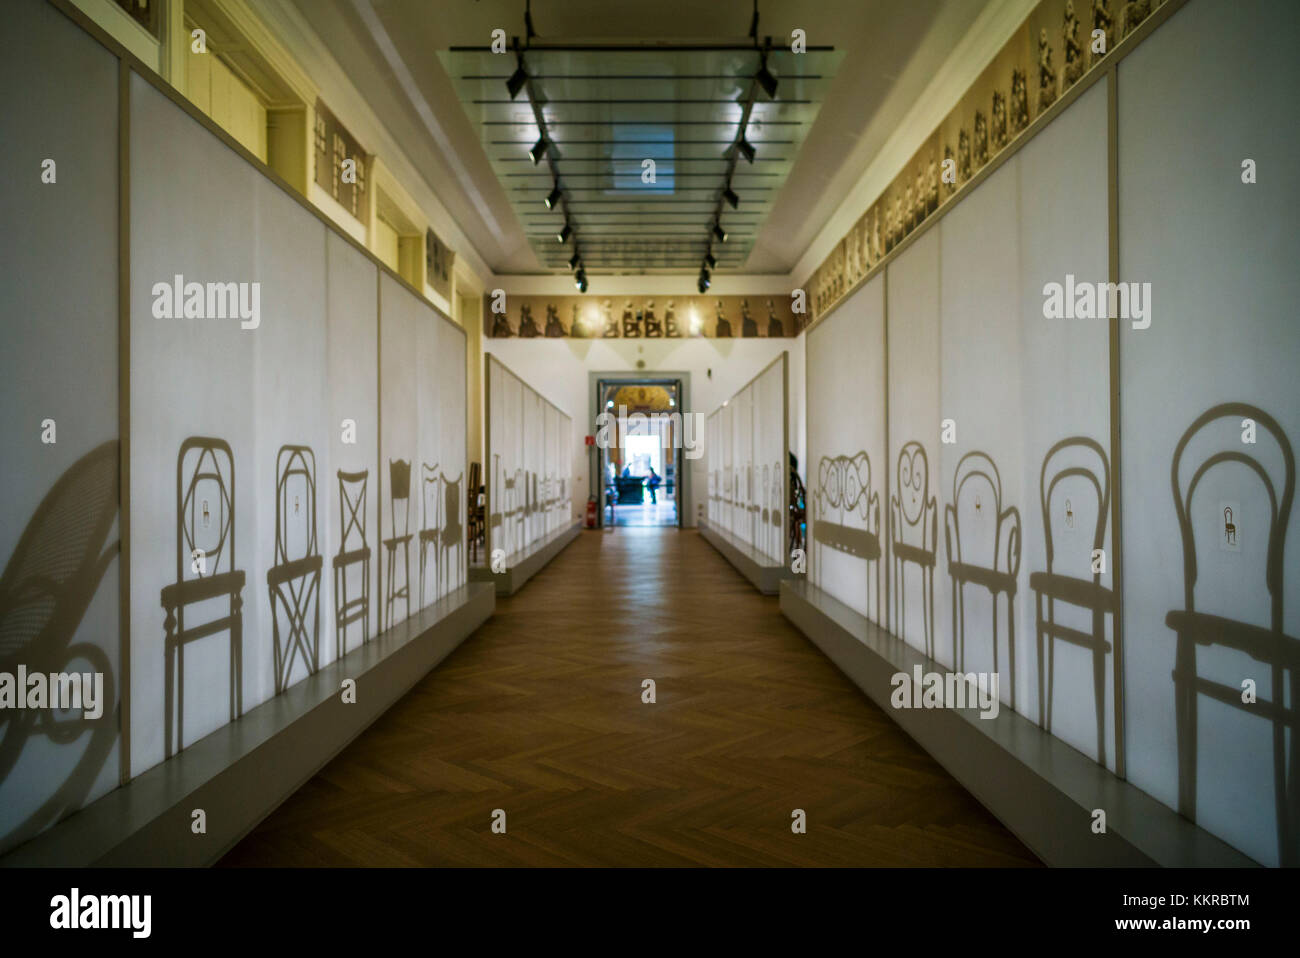 Austria Viena Museo De Artes Aplicadas Mak Sombras De Dise Os  # Muebles Historicos